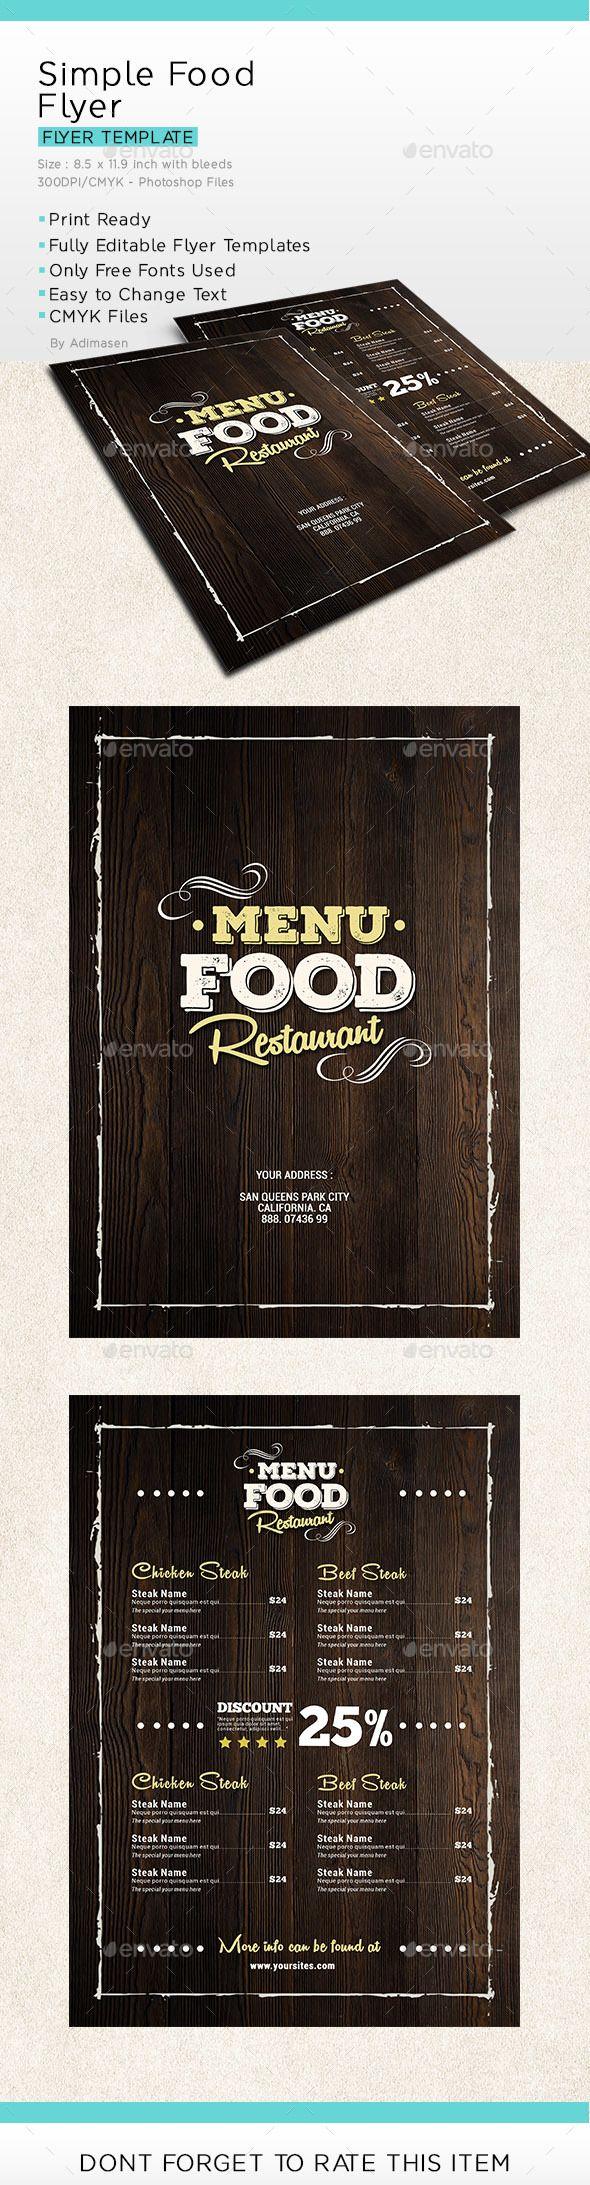 Menus Templates Free Simple Food Menu Flyer  Food Menu Menu Templates And Food Menu .